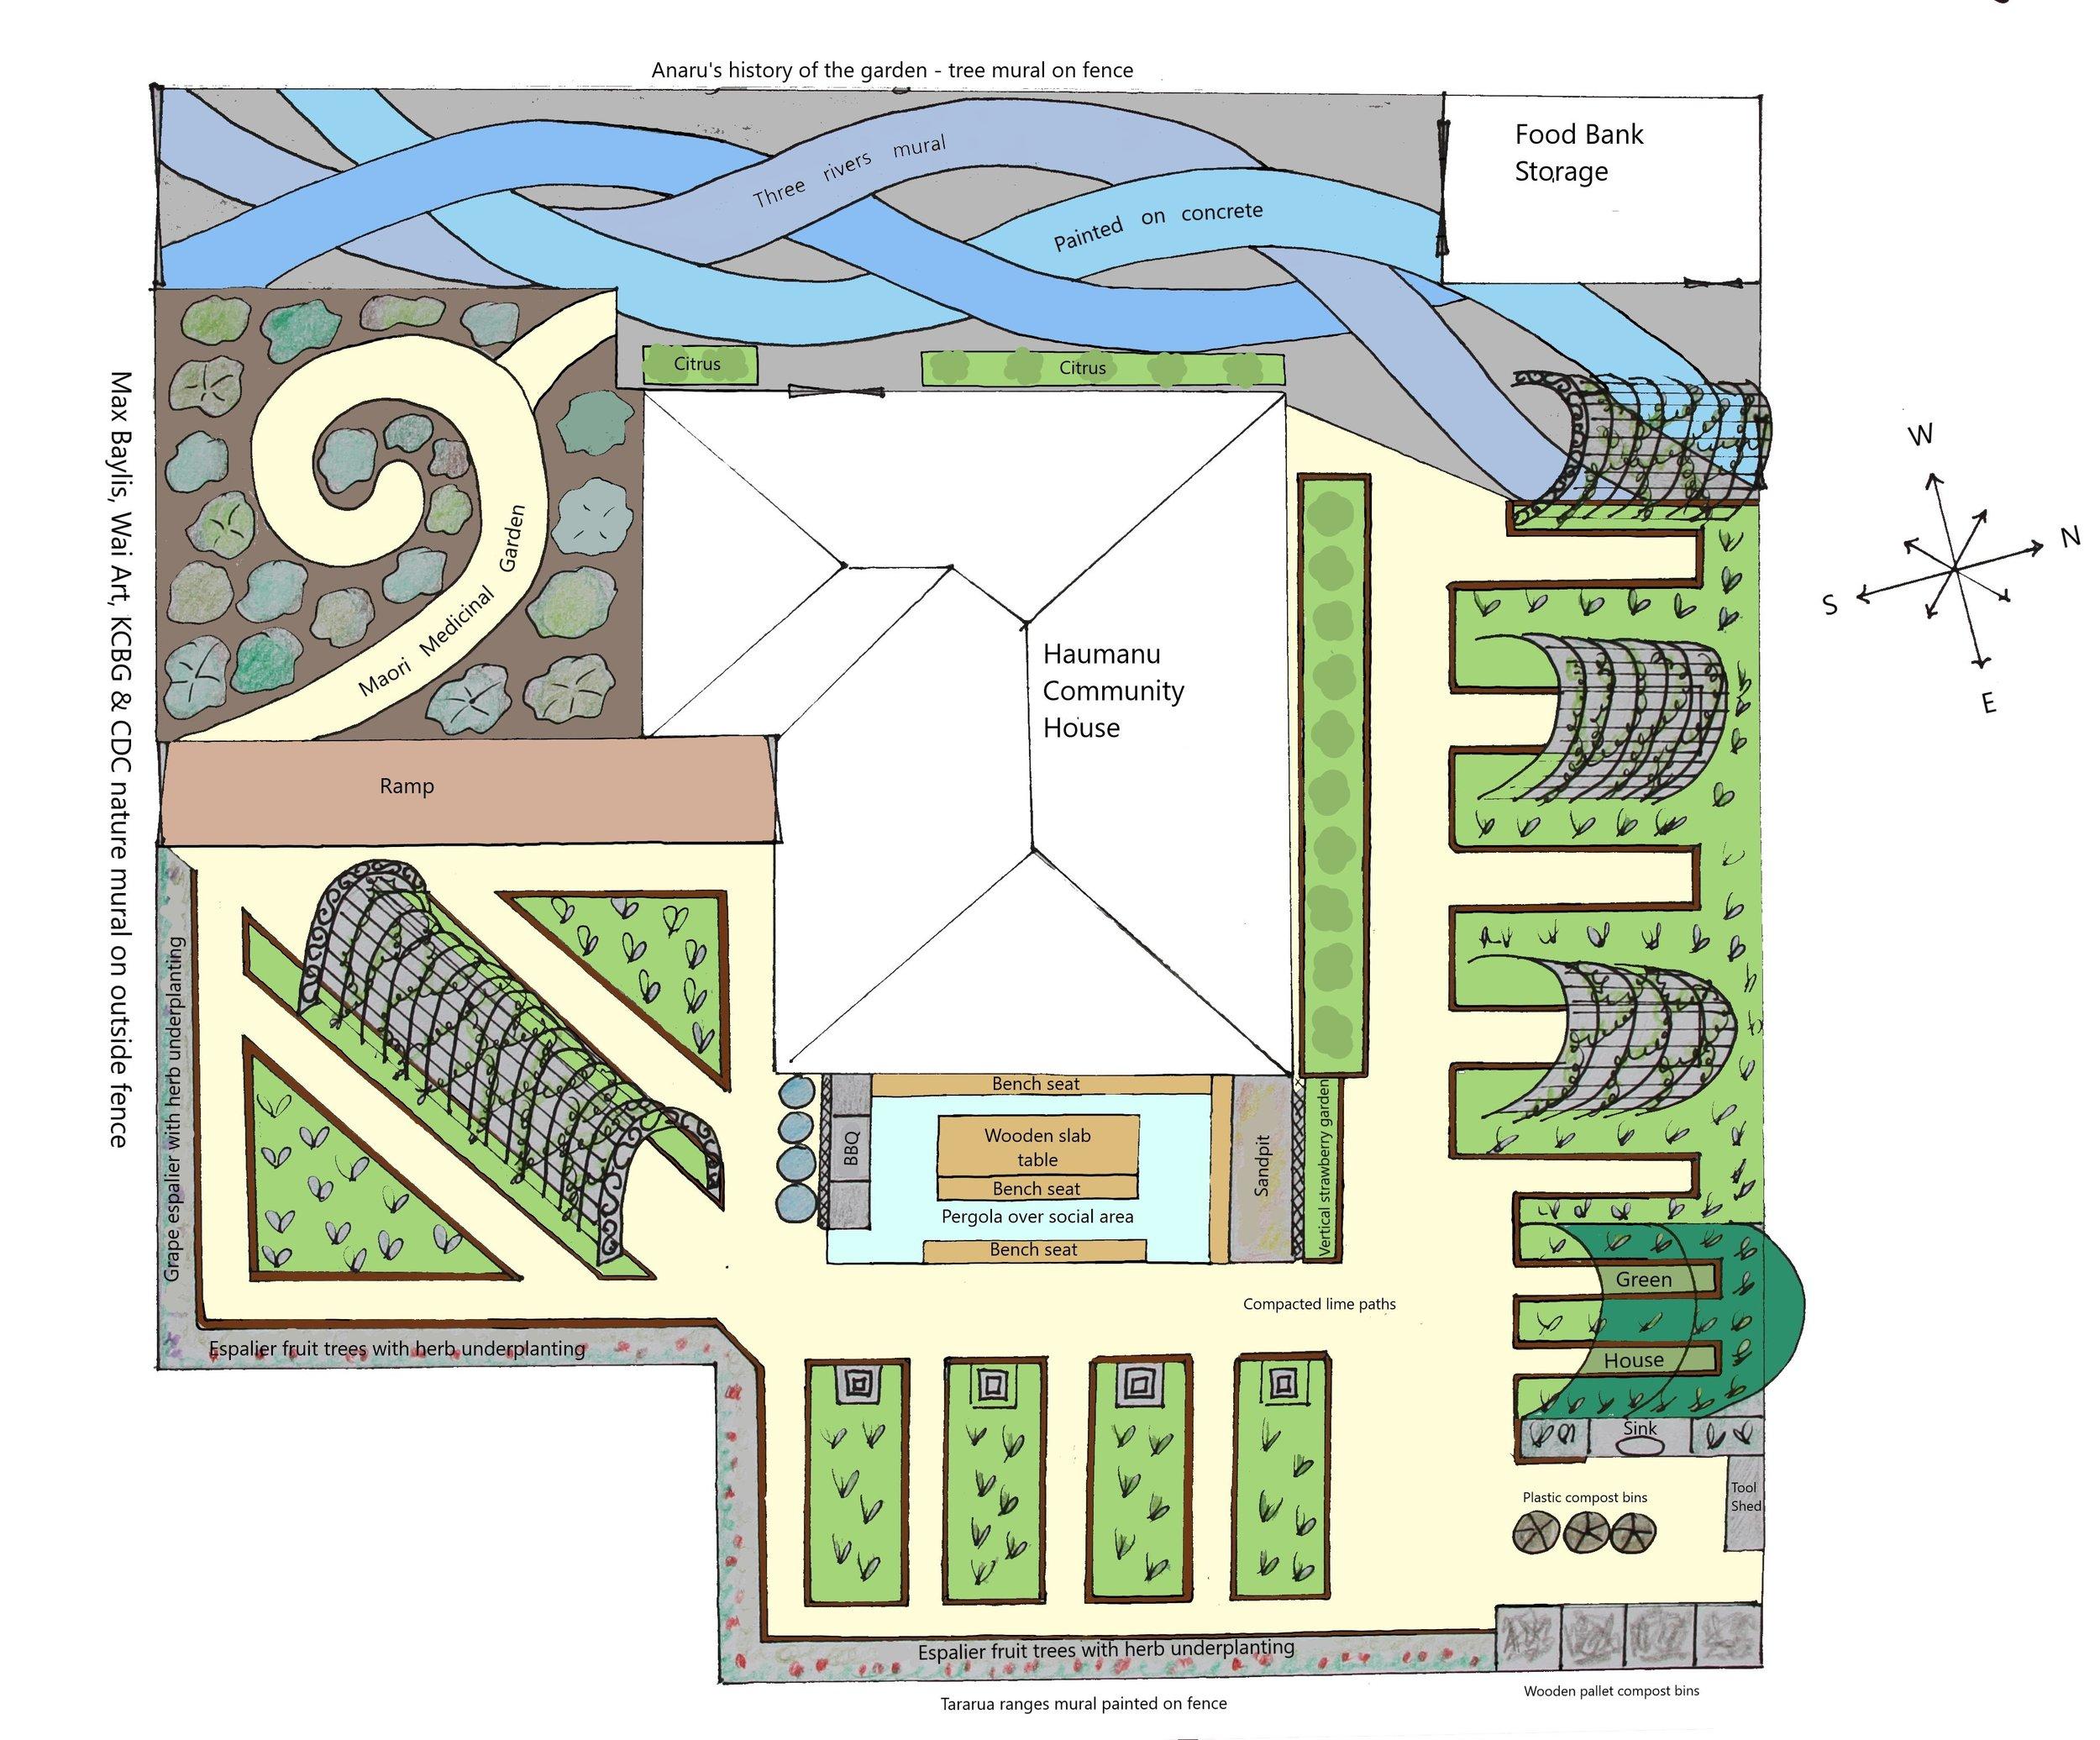 The new garden design